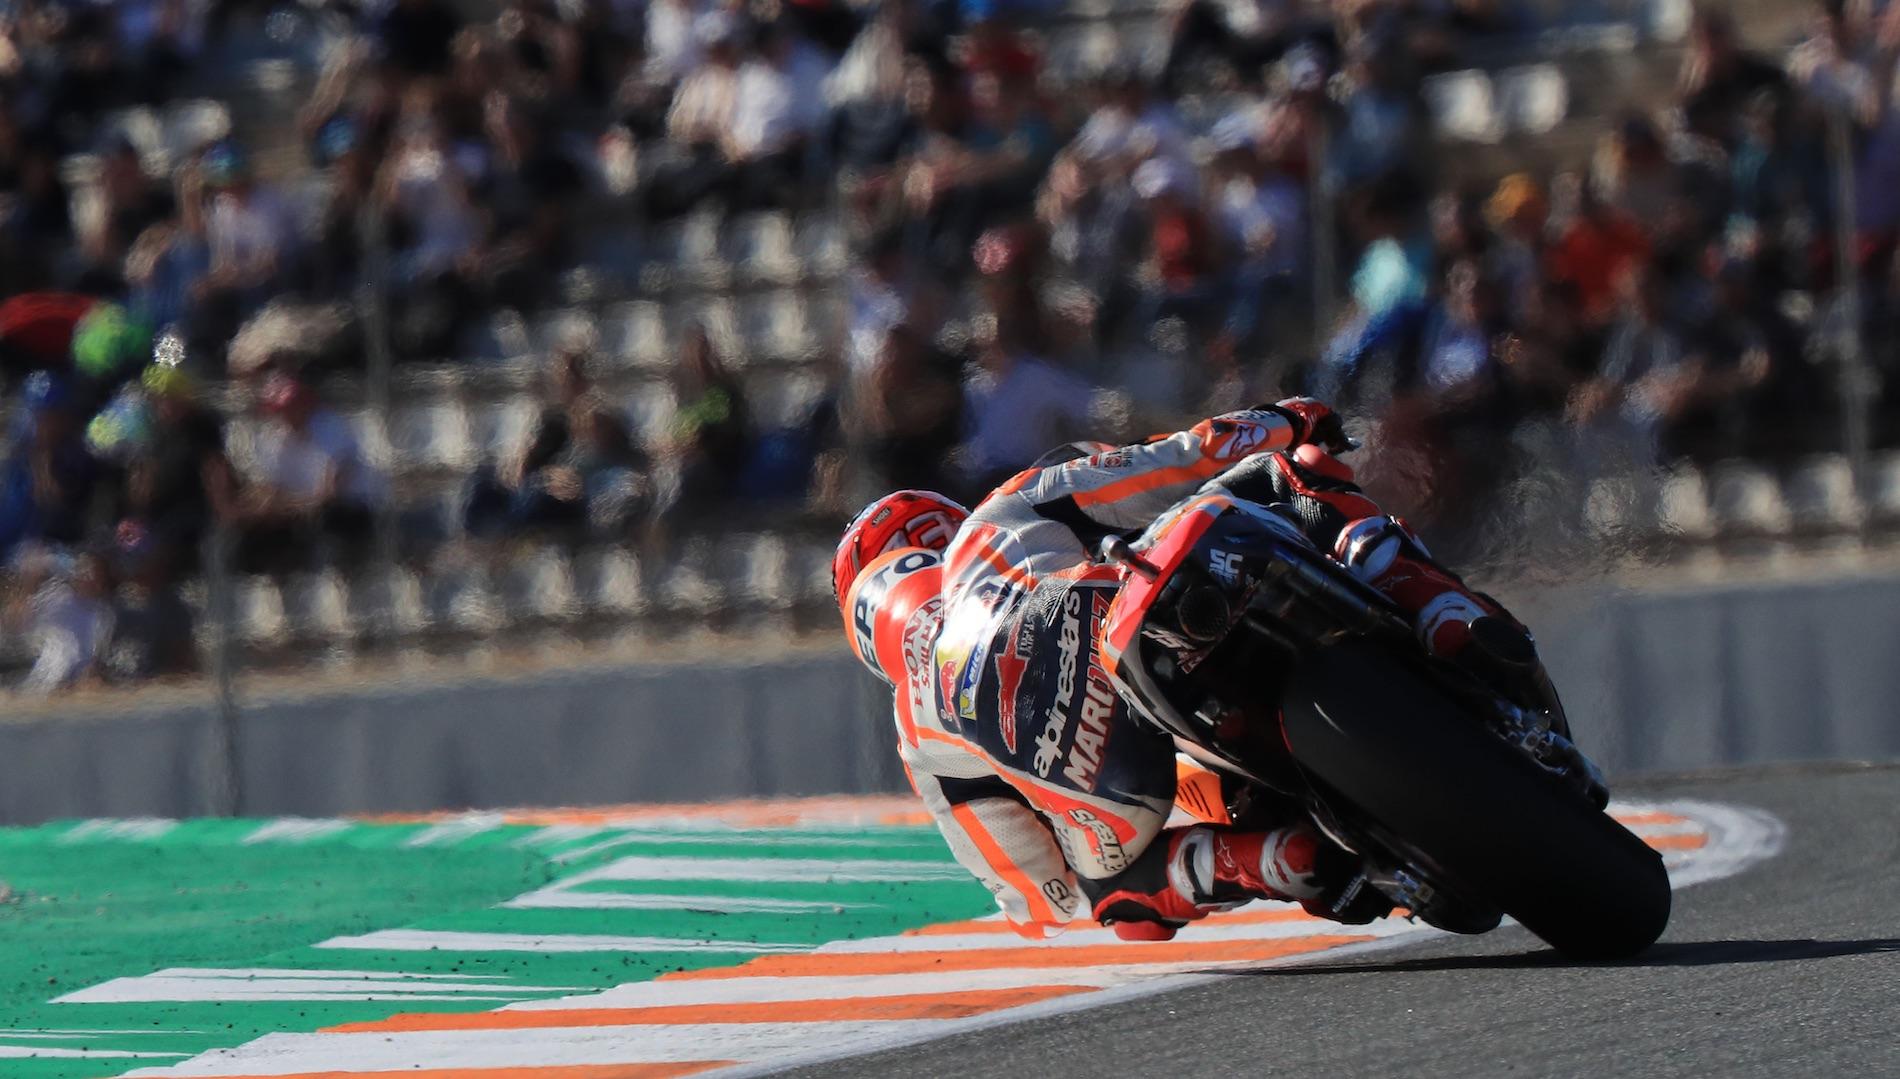 Pole position de Marc Márquez en MotoGP, Andrea Dovizioso en tercera fila